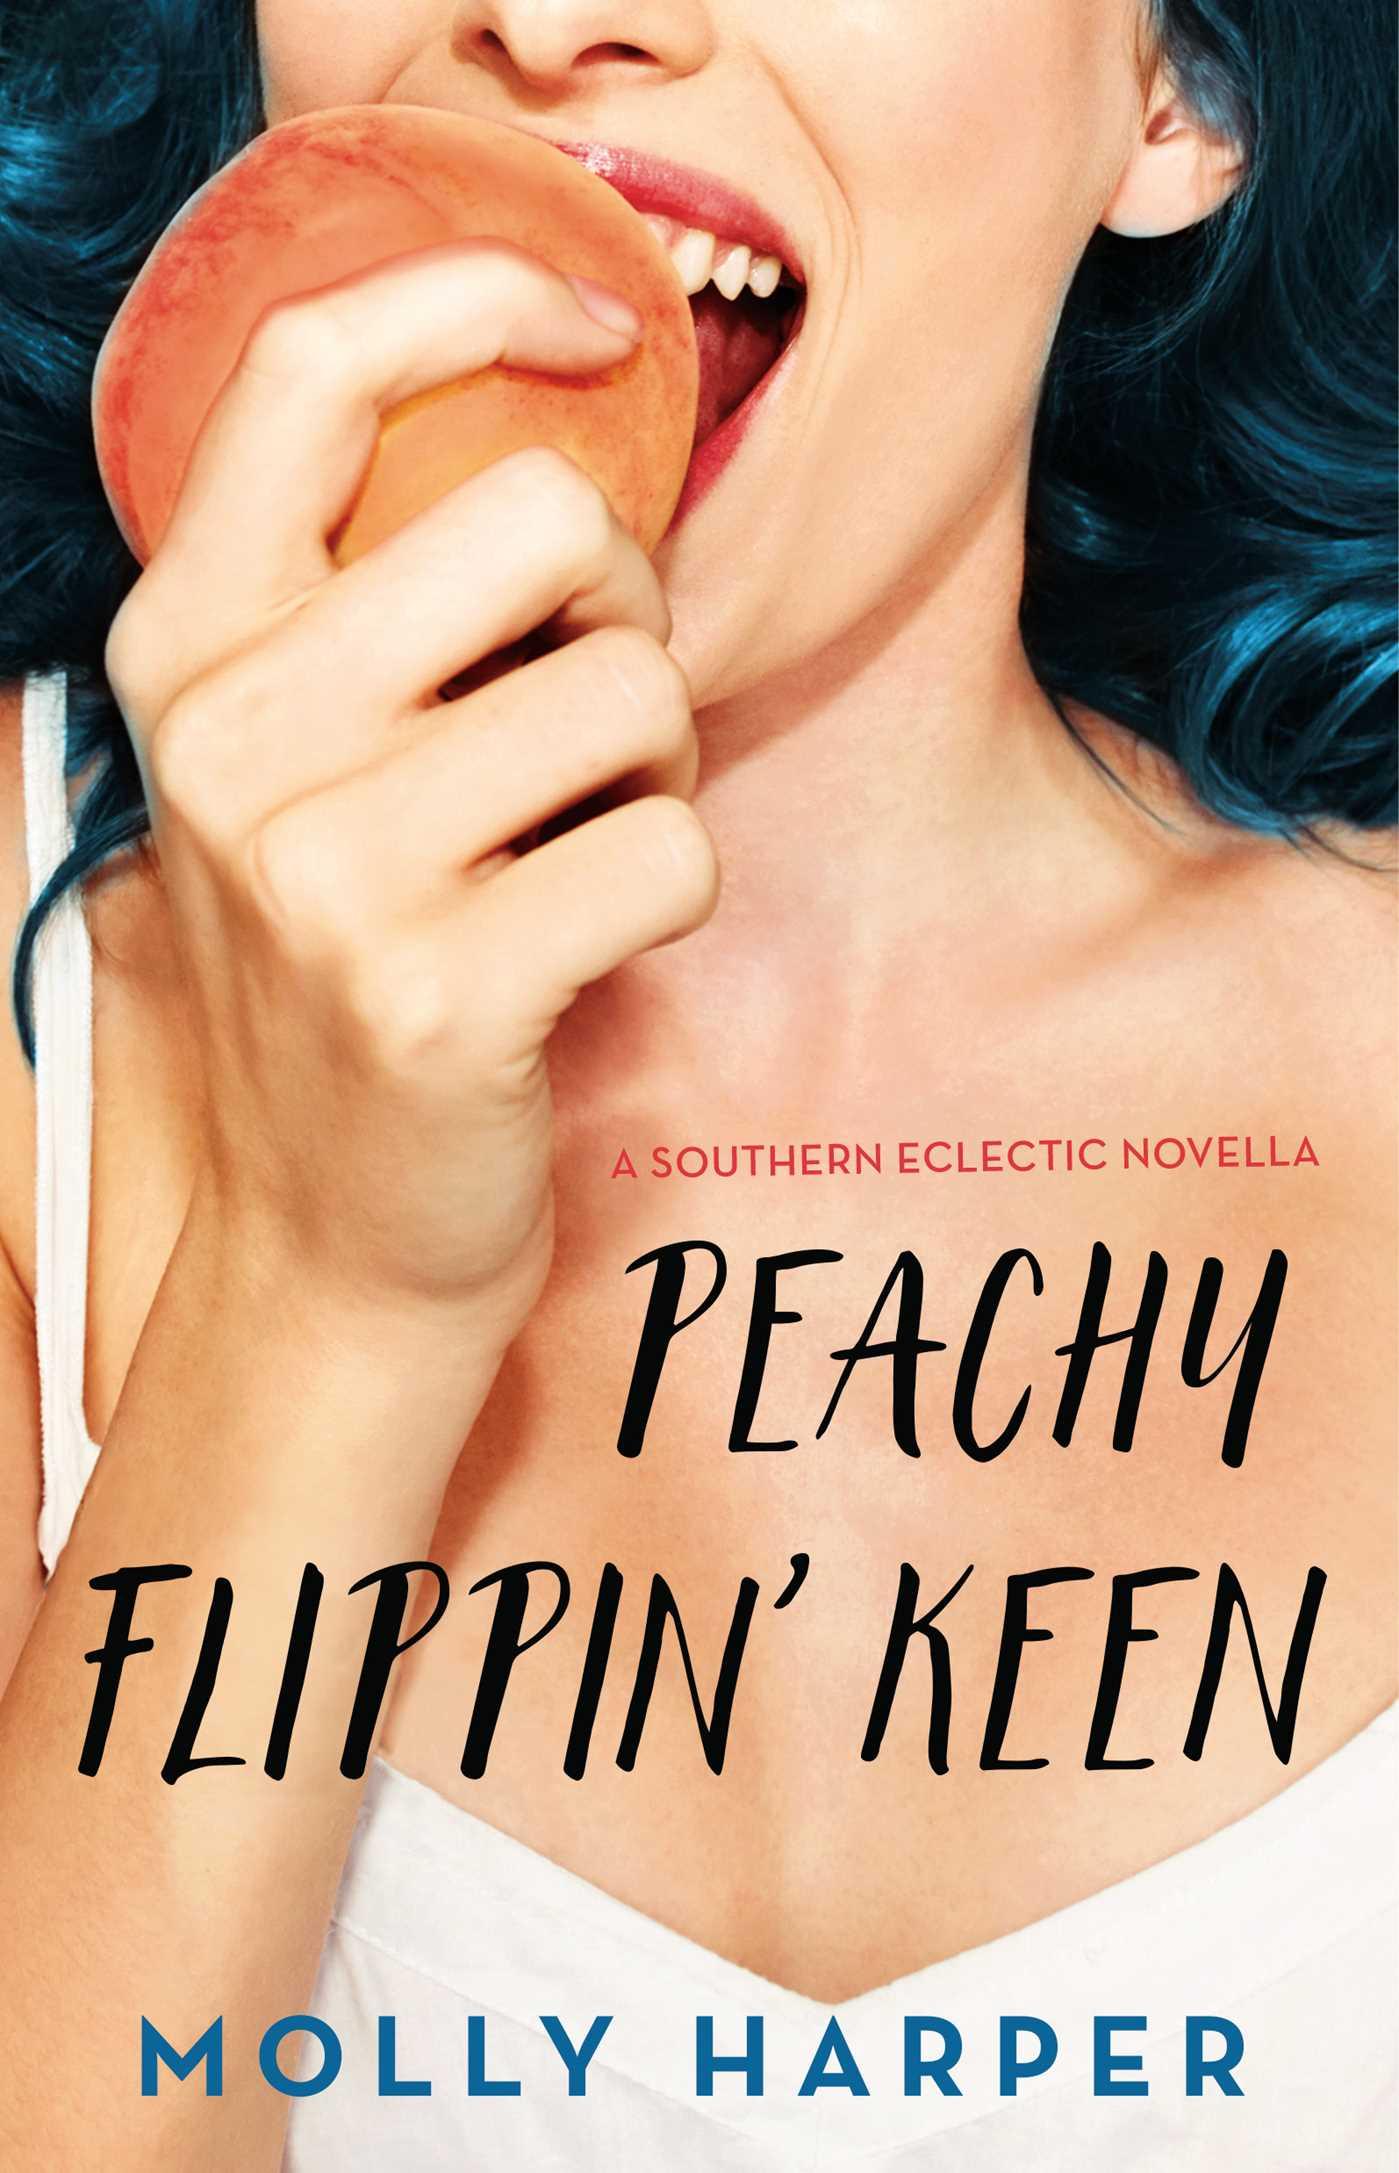 Peachy flippin keen 9781501178948 hr